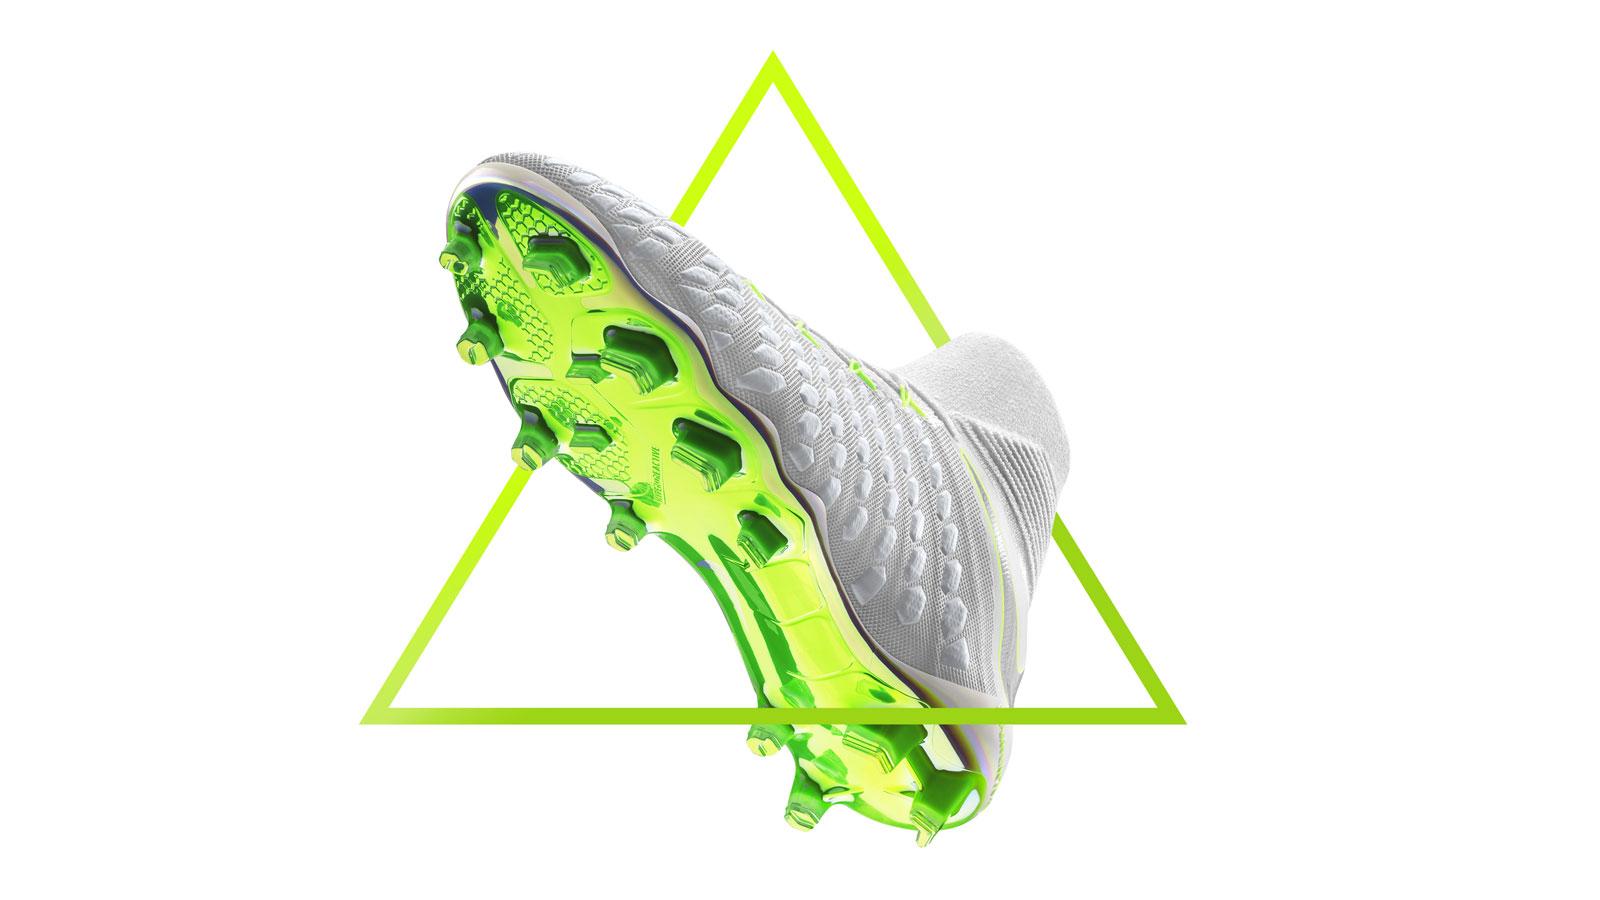 Nike Hypervenom Phantom III und Phantom III DF World Cup Fußballschuhe